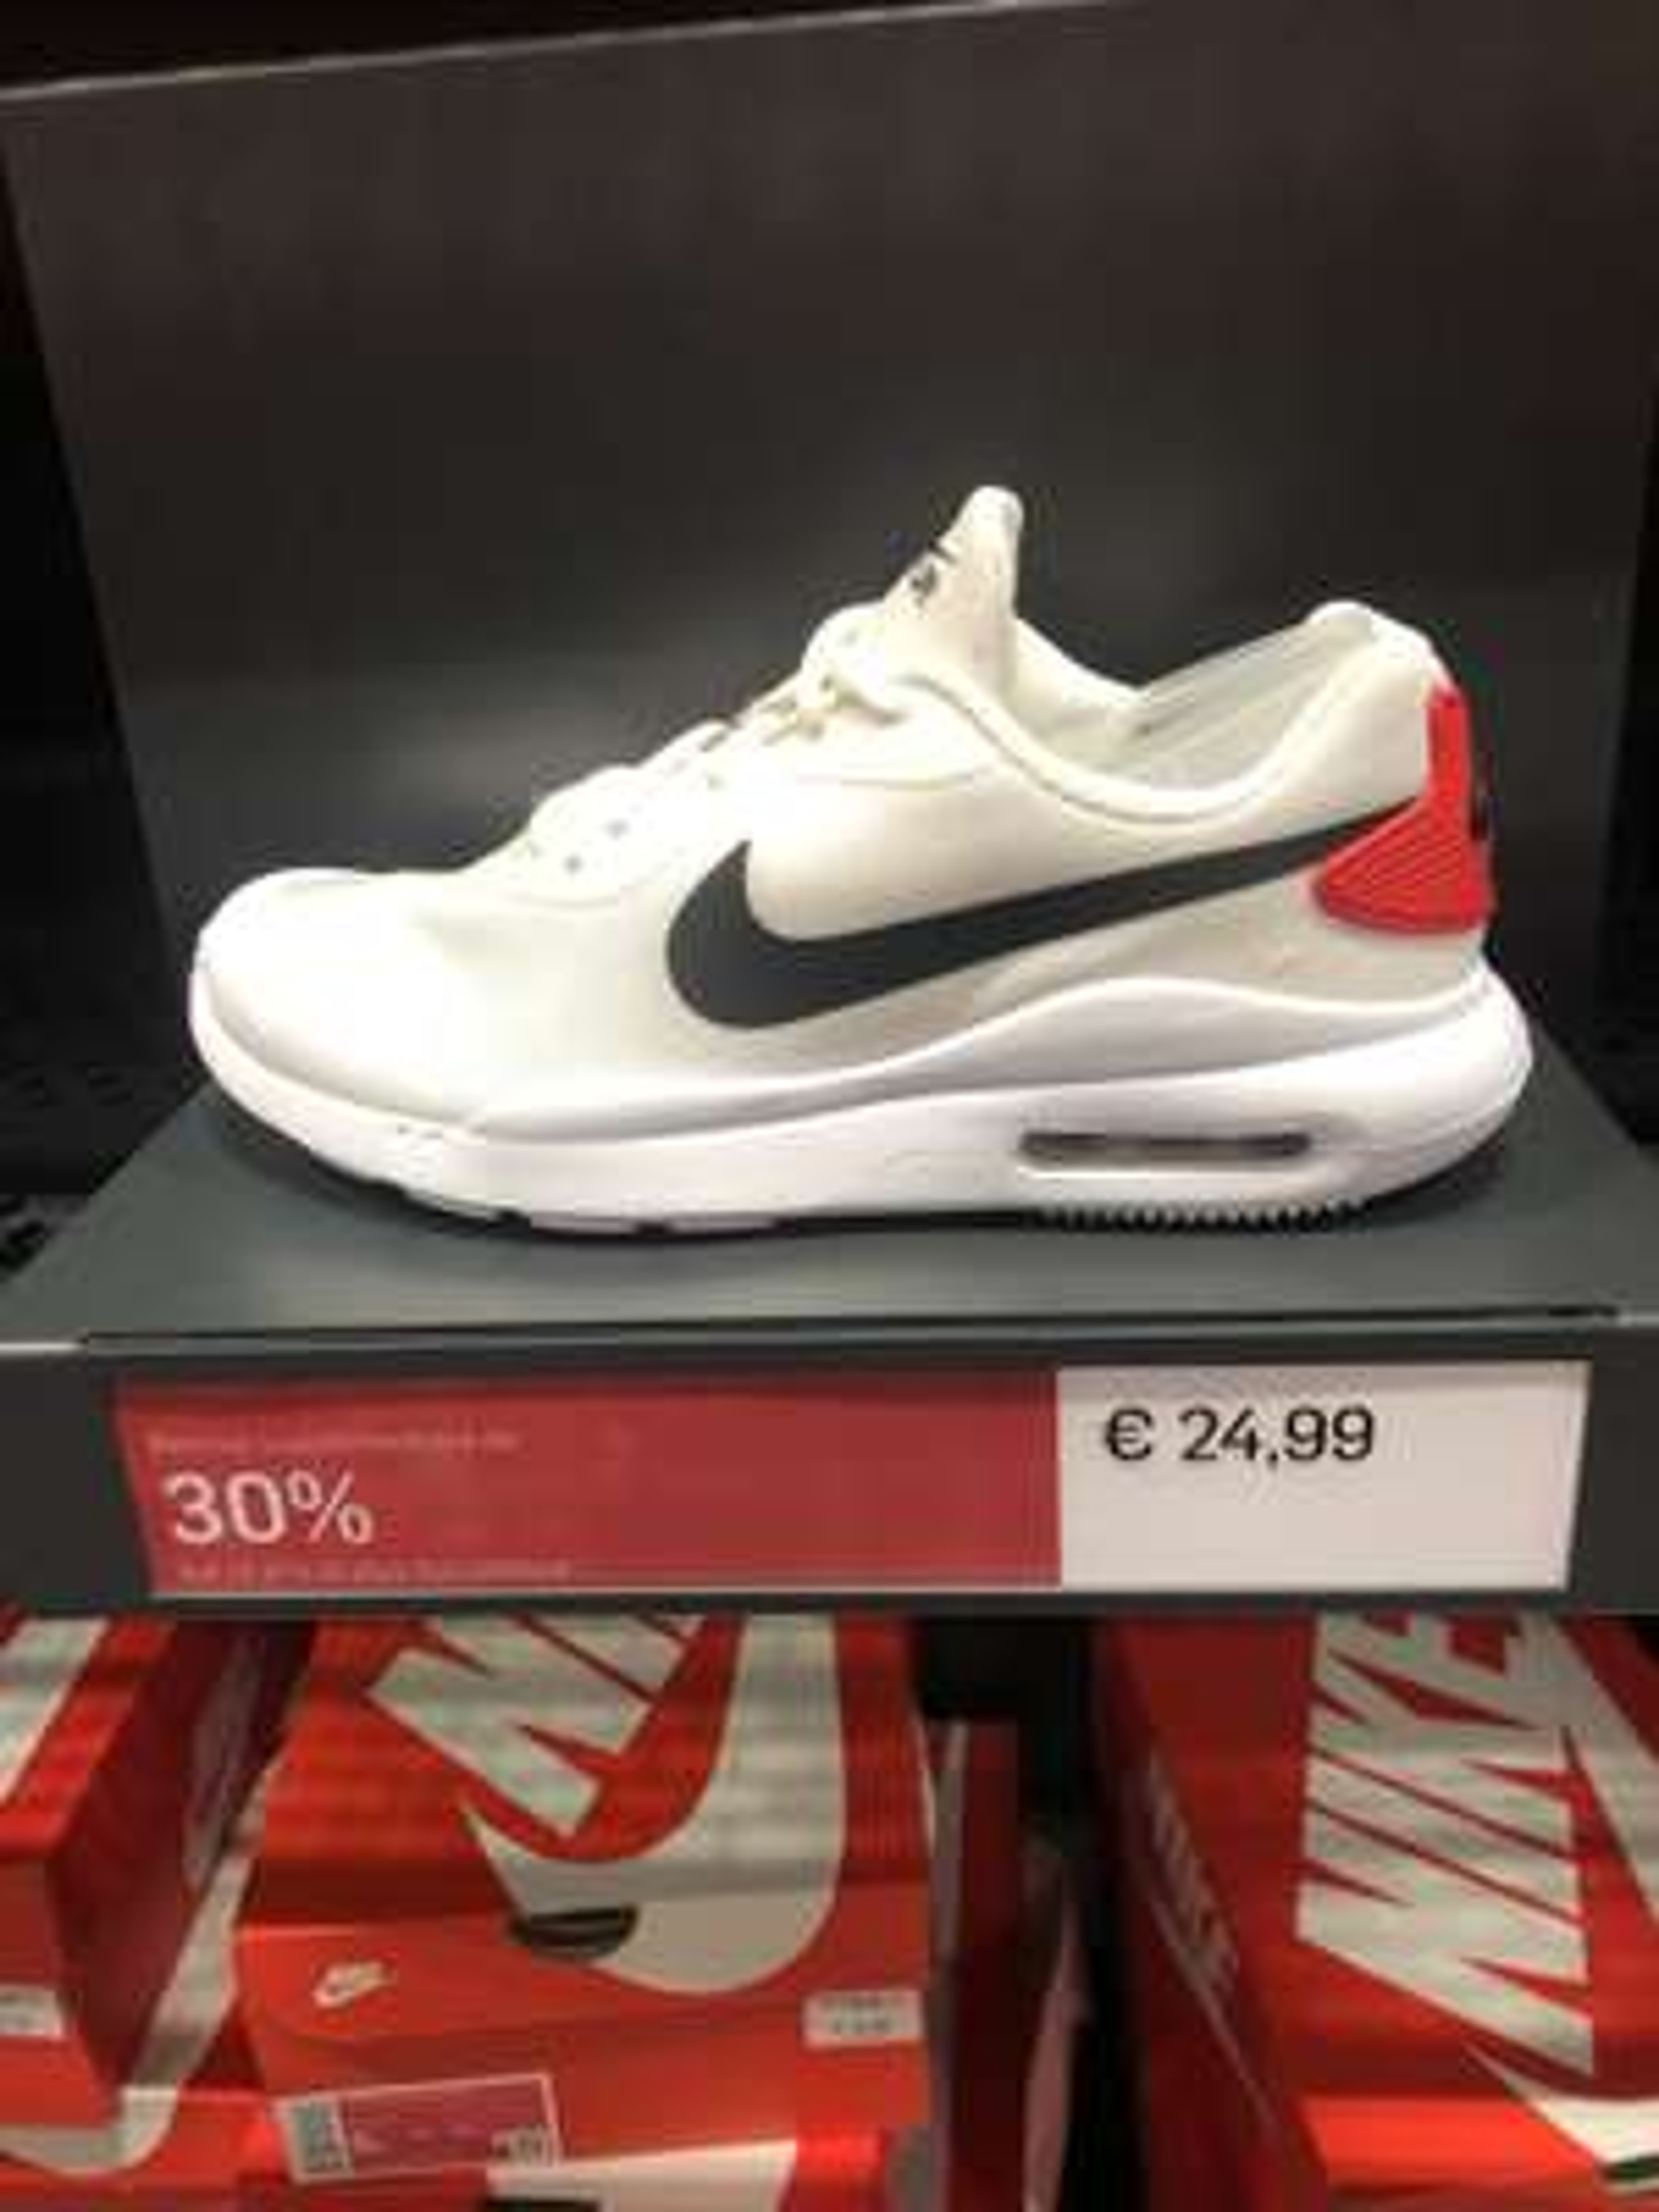 Basket Nike Air Max Oketo Junior - Nike Factory Herblay (95)